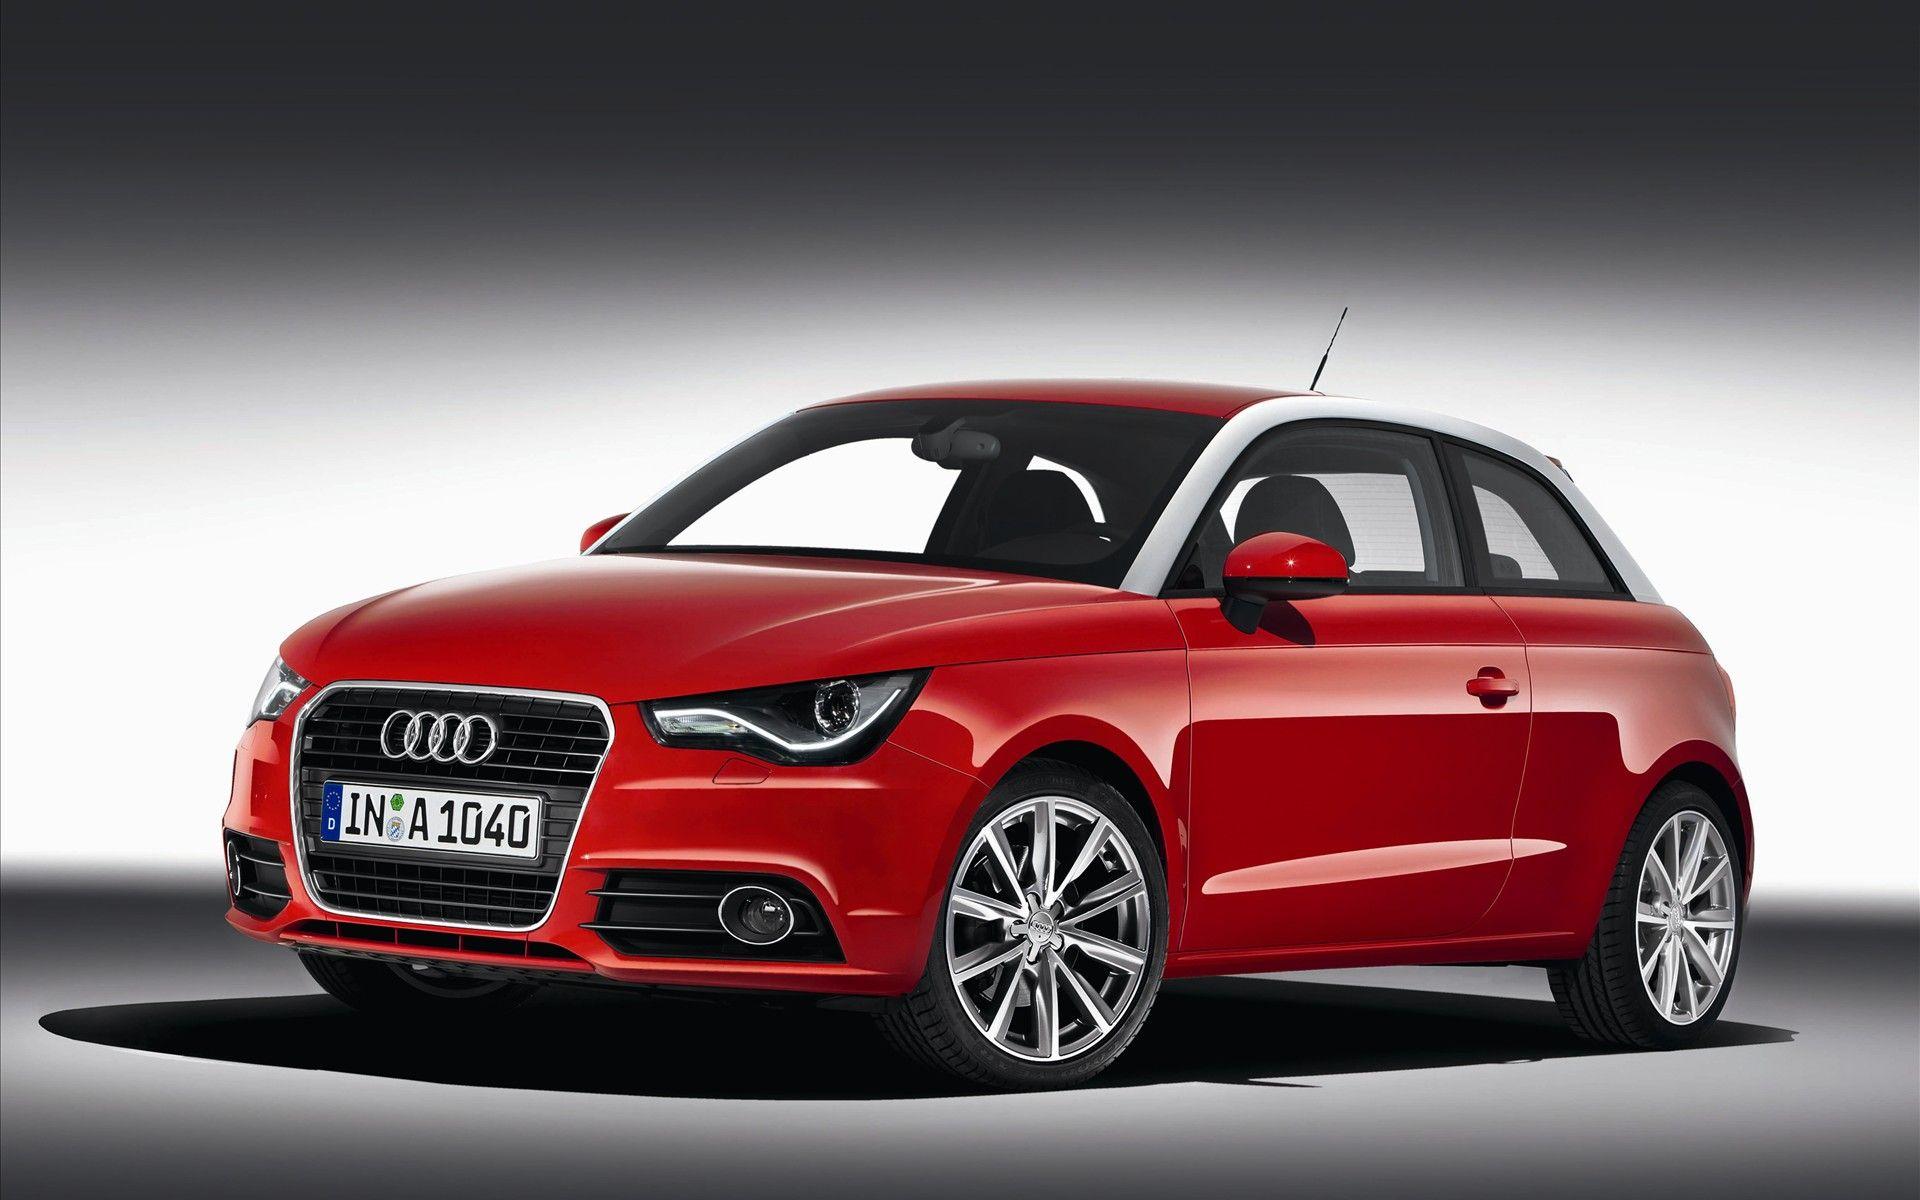 Red Audi A1 Audi Cars Hatchback Cars